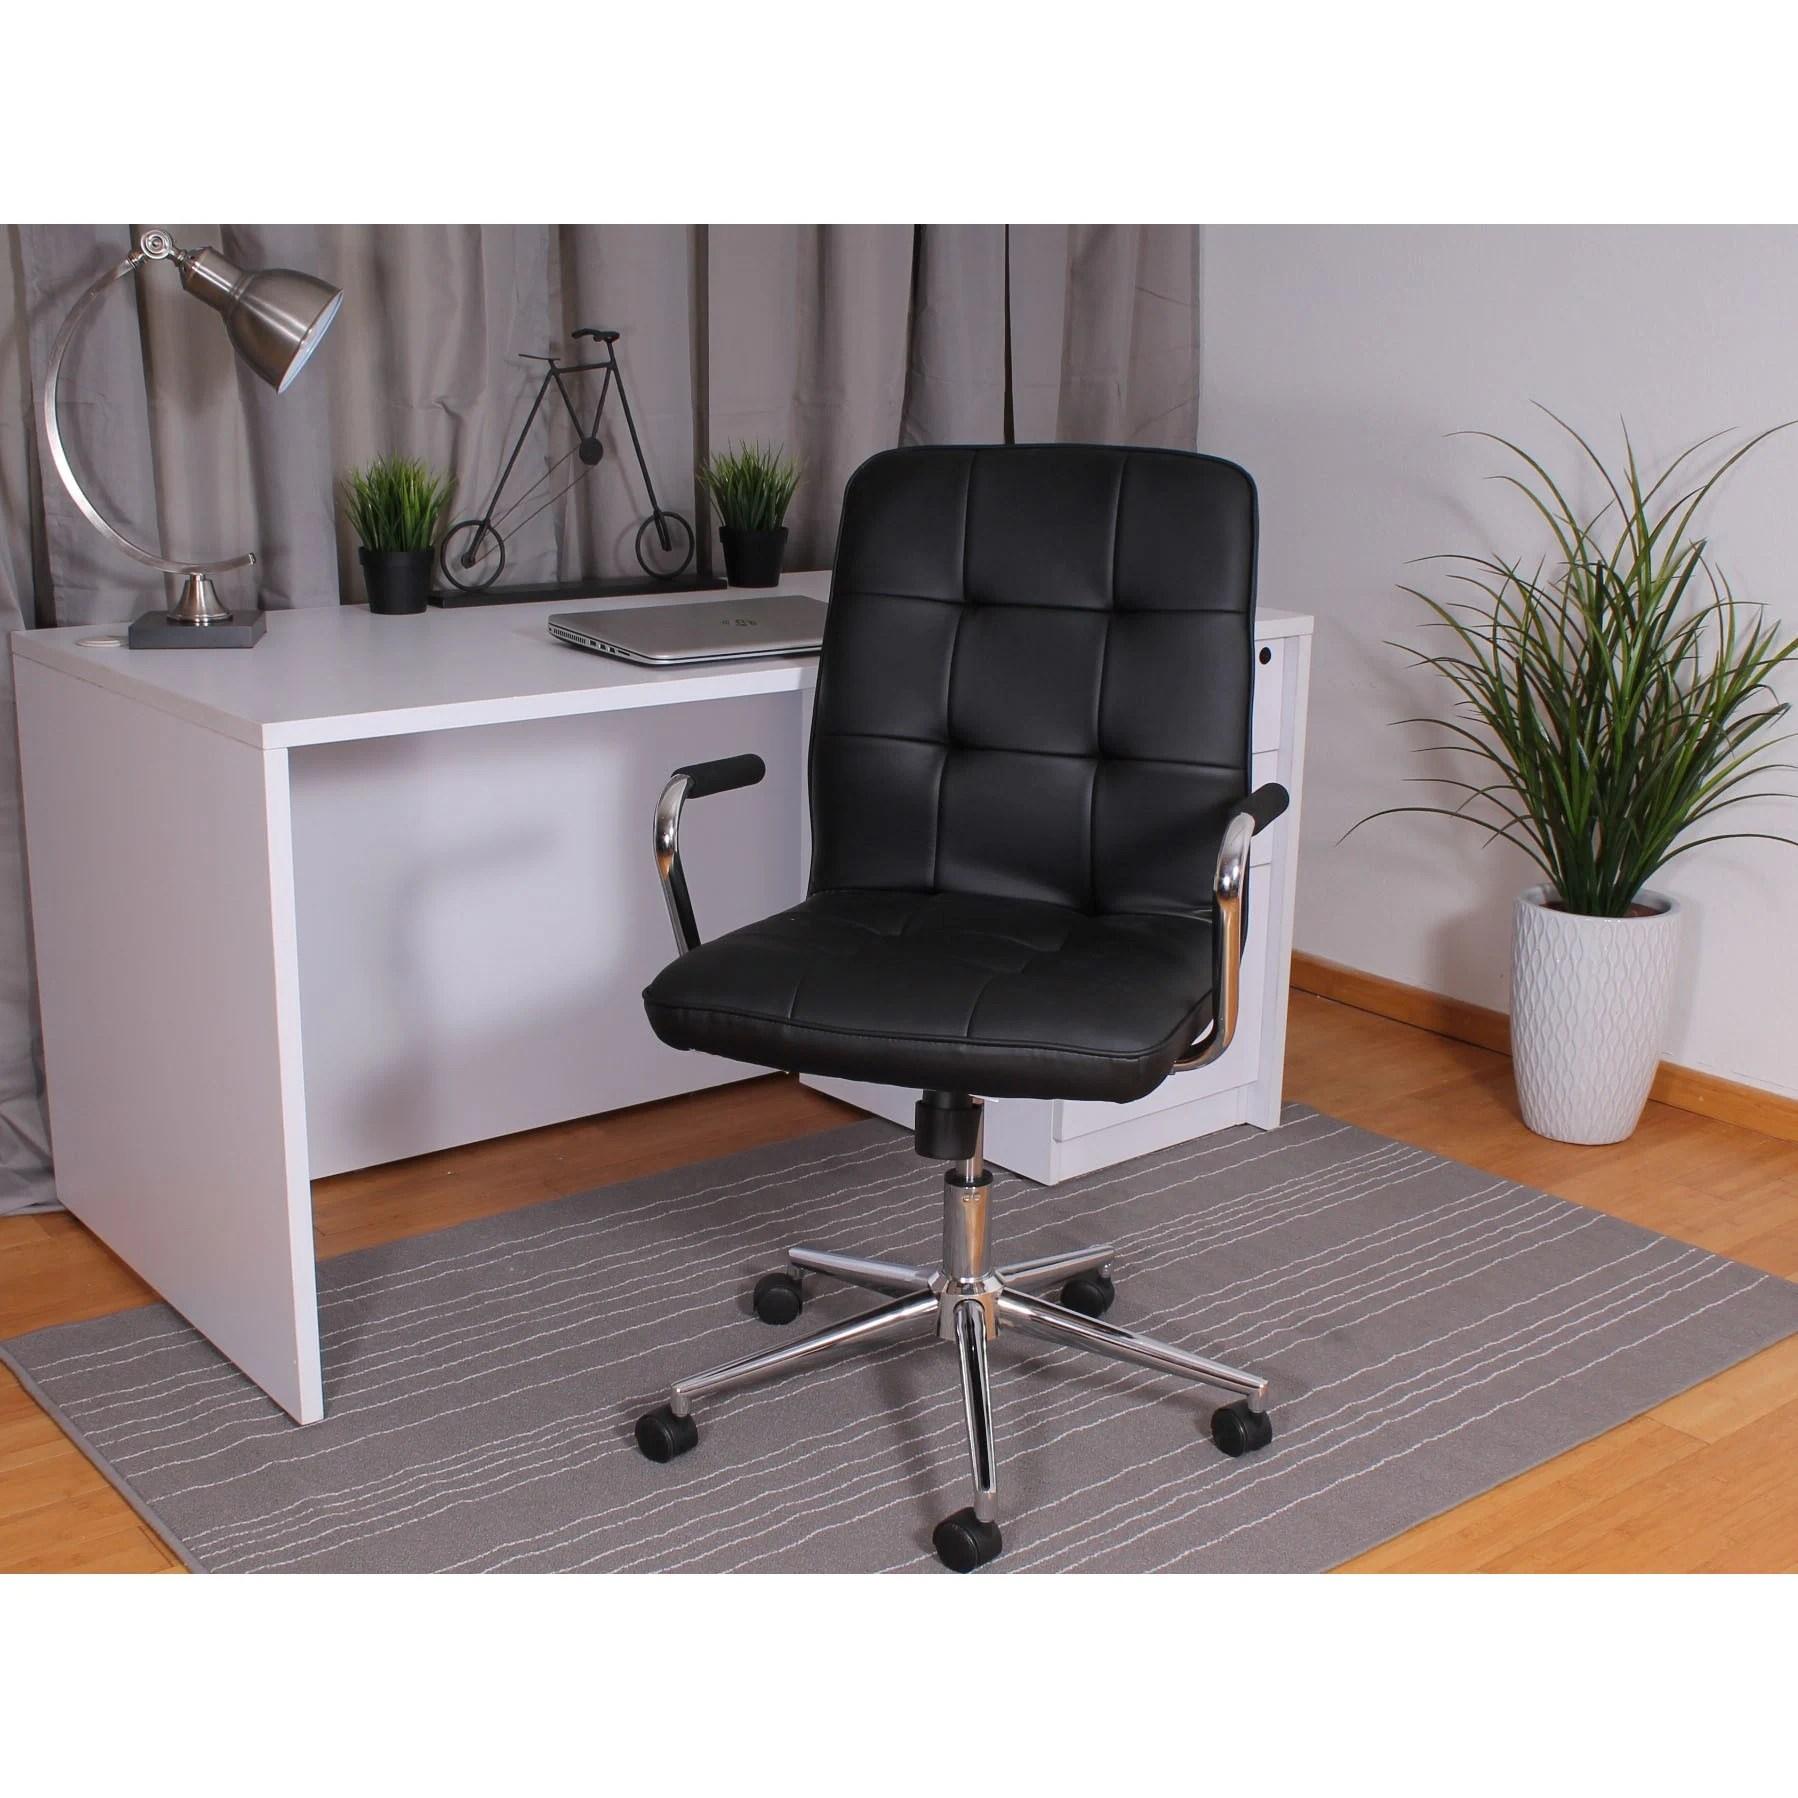 boss modern ergonomic office chair red salon shop free shipping on orders